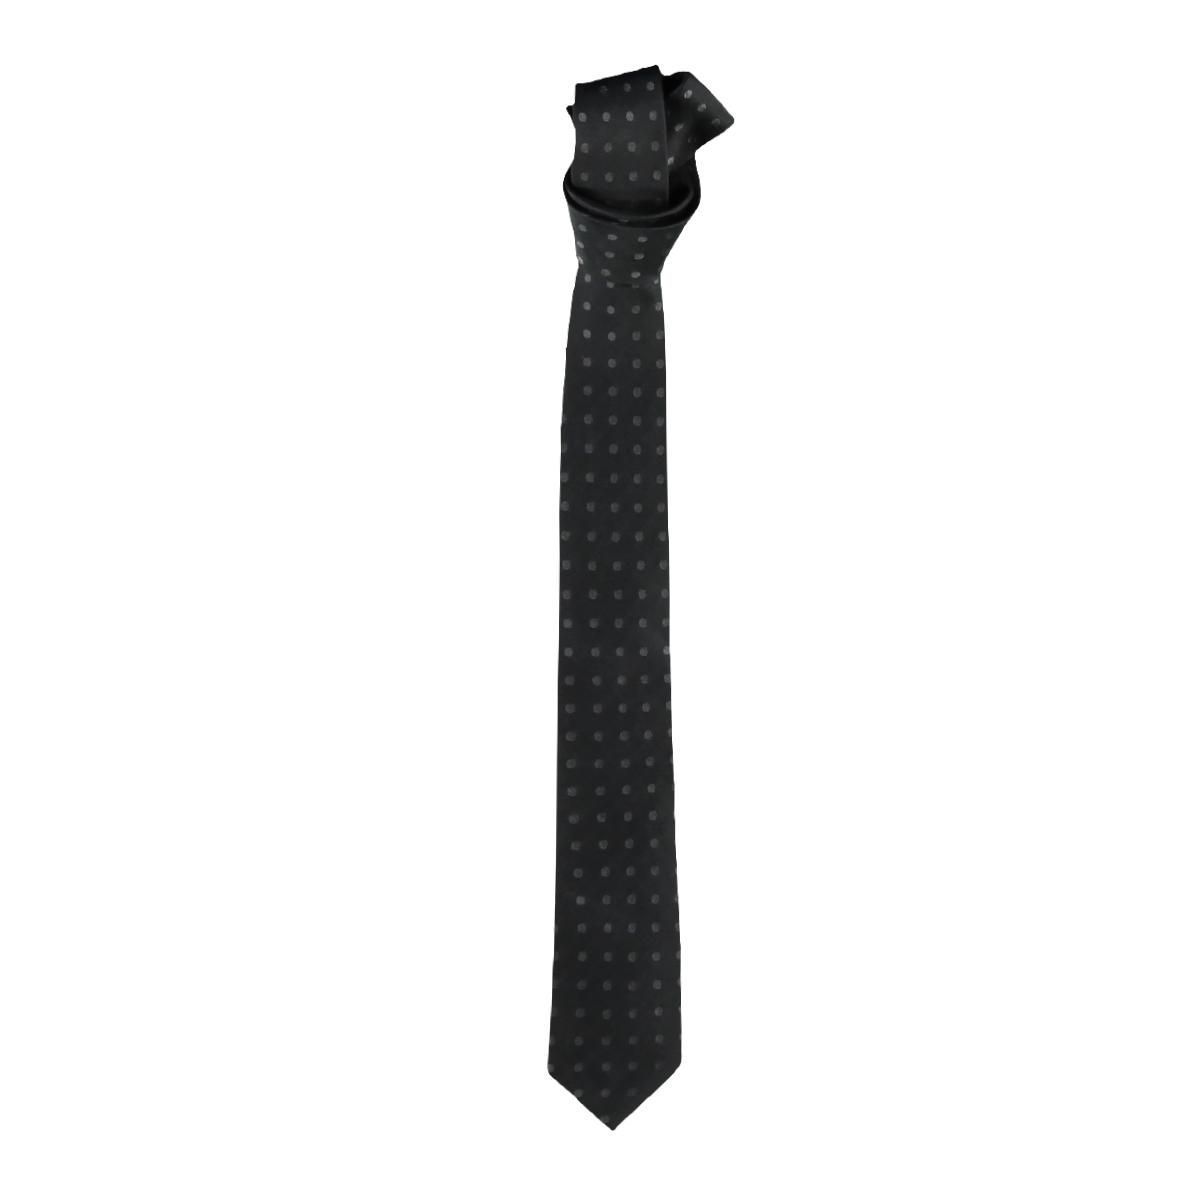 ENGBERS engbers Krawatte